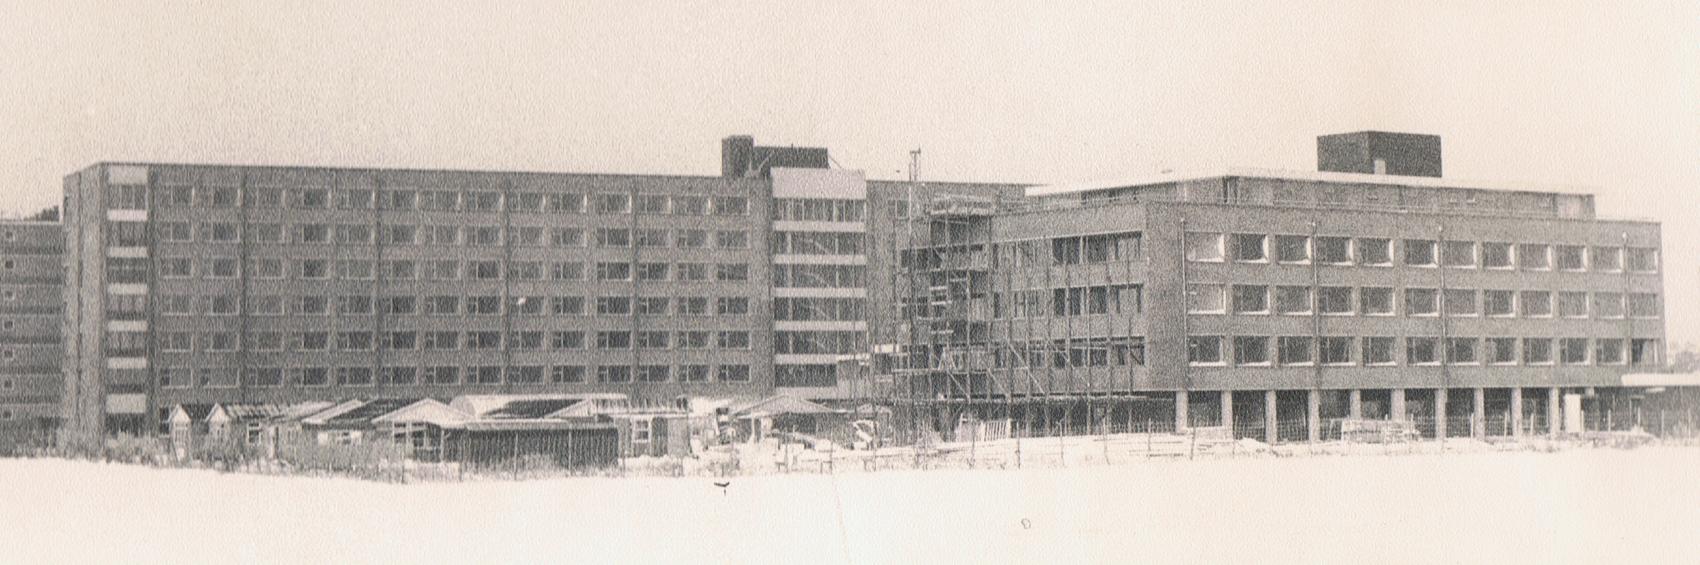 1970.09 - Heymanscentrum - Bouw